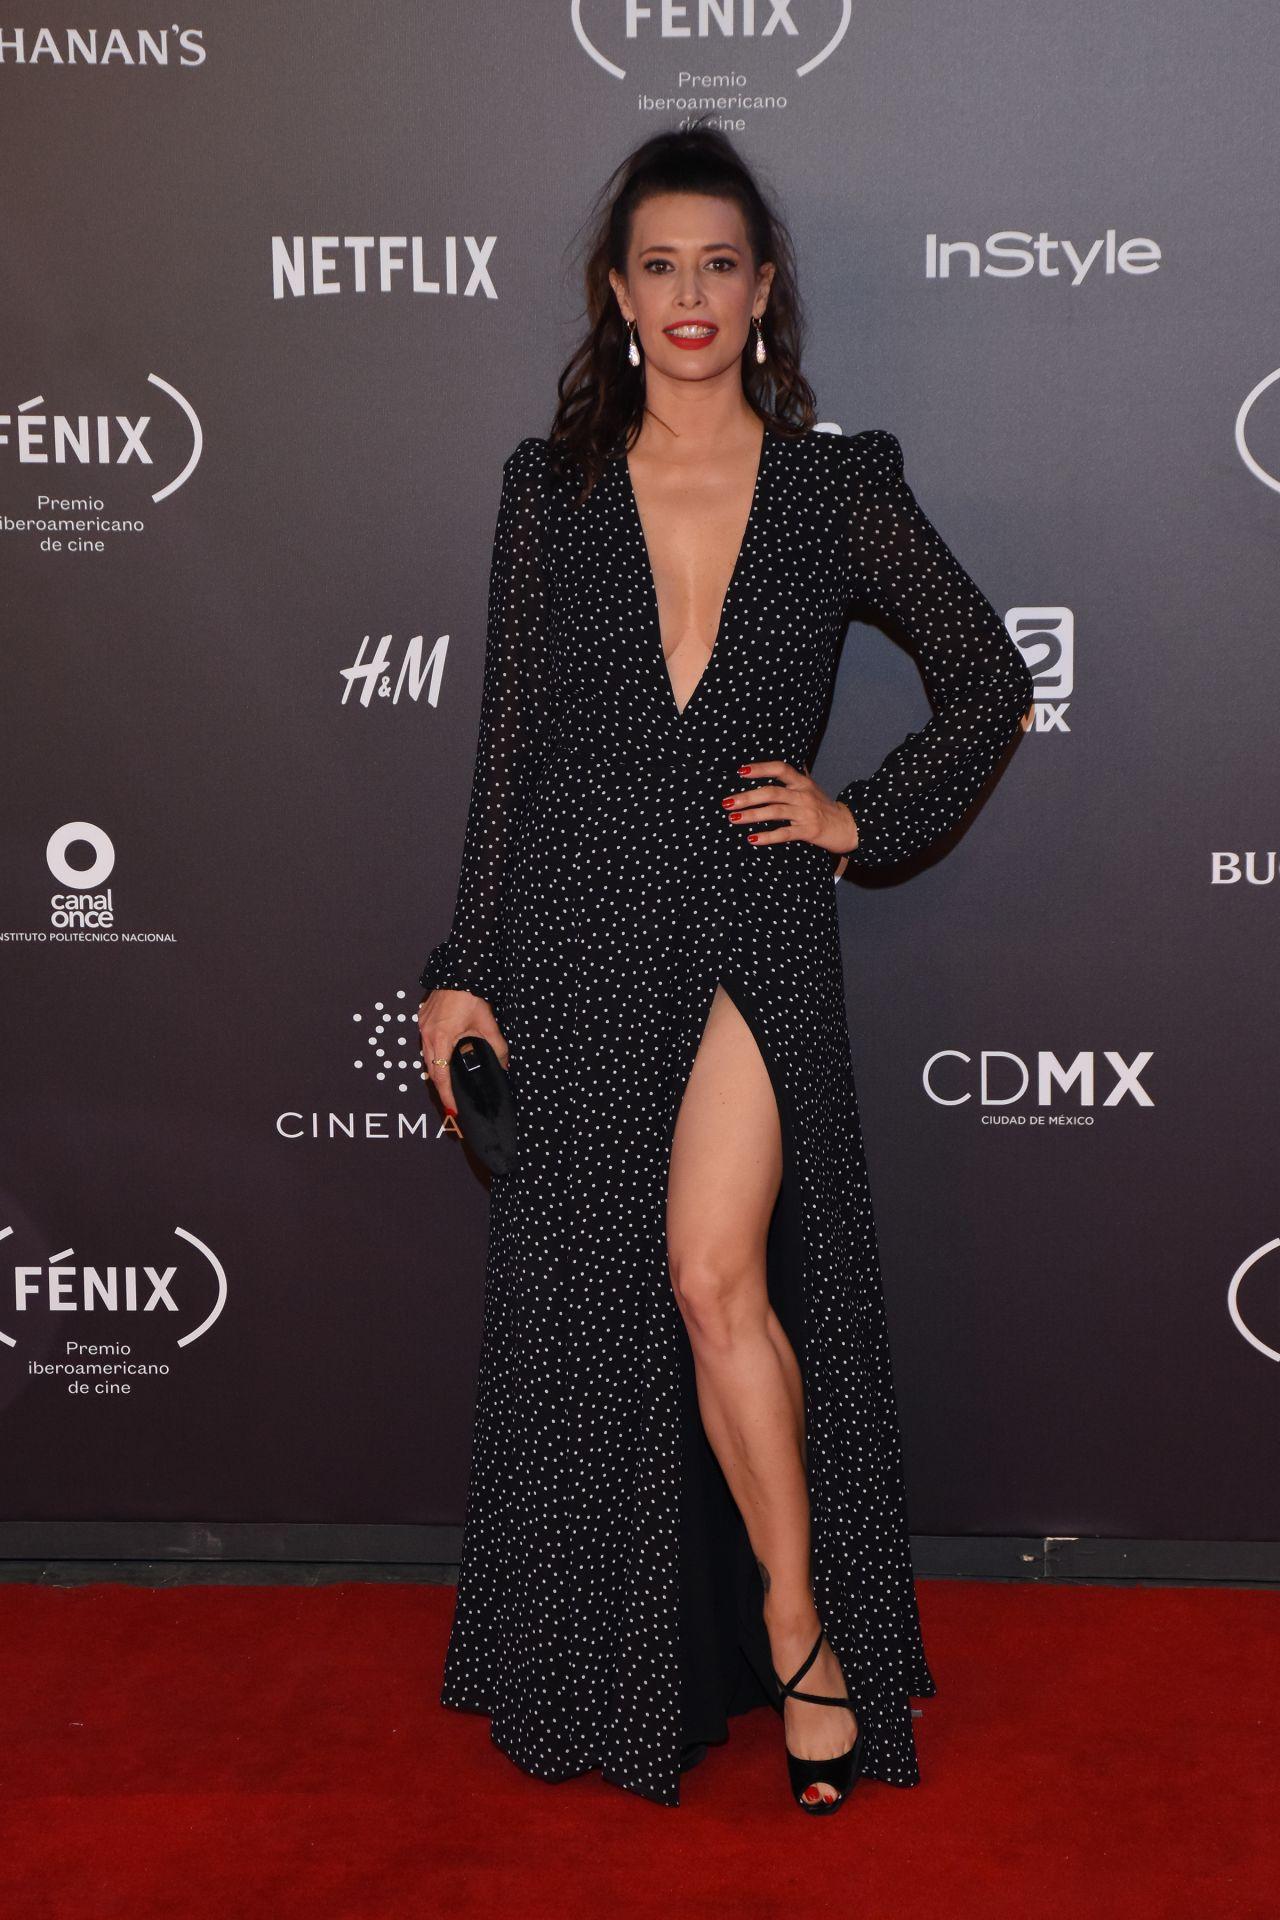 http://celebmafia.com/wp-content/uploads/2017/12/angie-cepeda-fenix-film-awards-2017-red-carpet-2.jpg